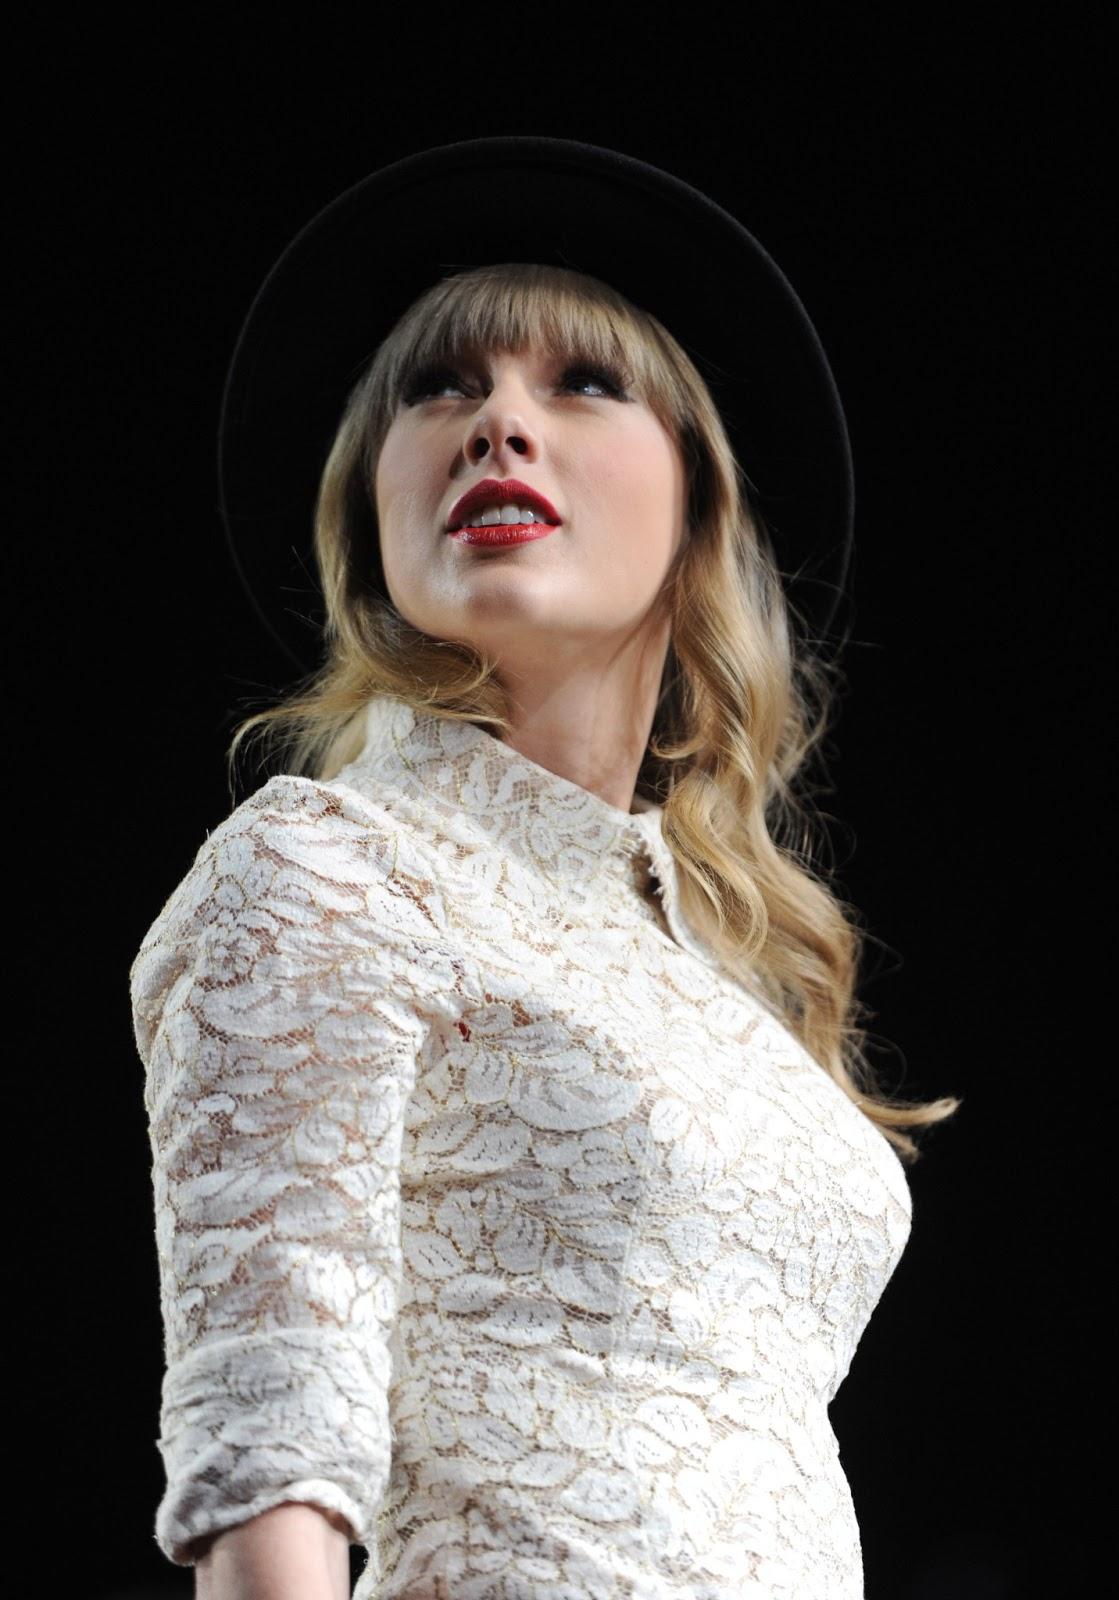 http://3.bp.blogspot.com/-MF09NxS6RJw/UVUQHFvBQPI/AAAAAAAAKF0/ih6-CLW6aQA/s1600/Taylor+Swift.jpg